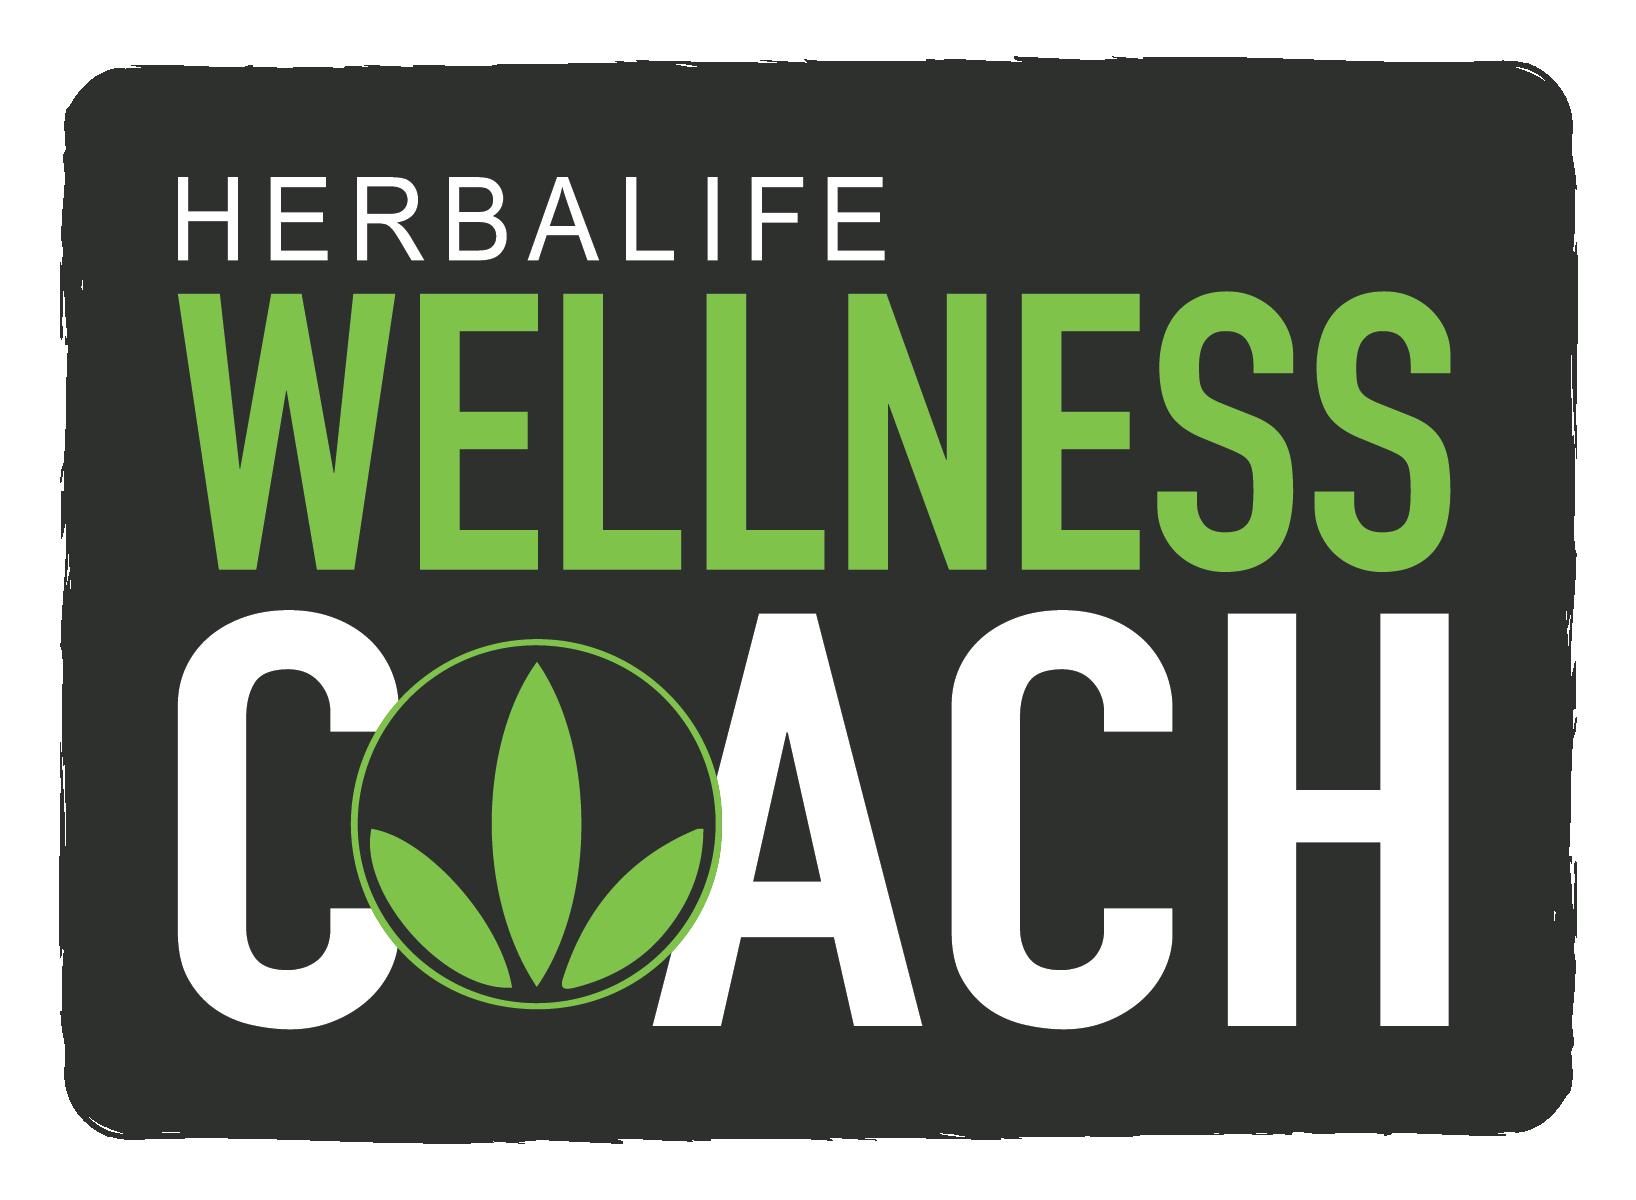 Herbalife Wellness Coach Charcoal Grey Tank Top Design Herbalife Herbalife Nutrition Wellness Coach